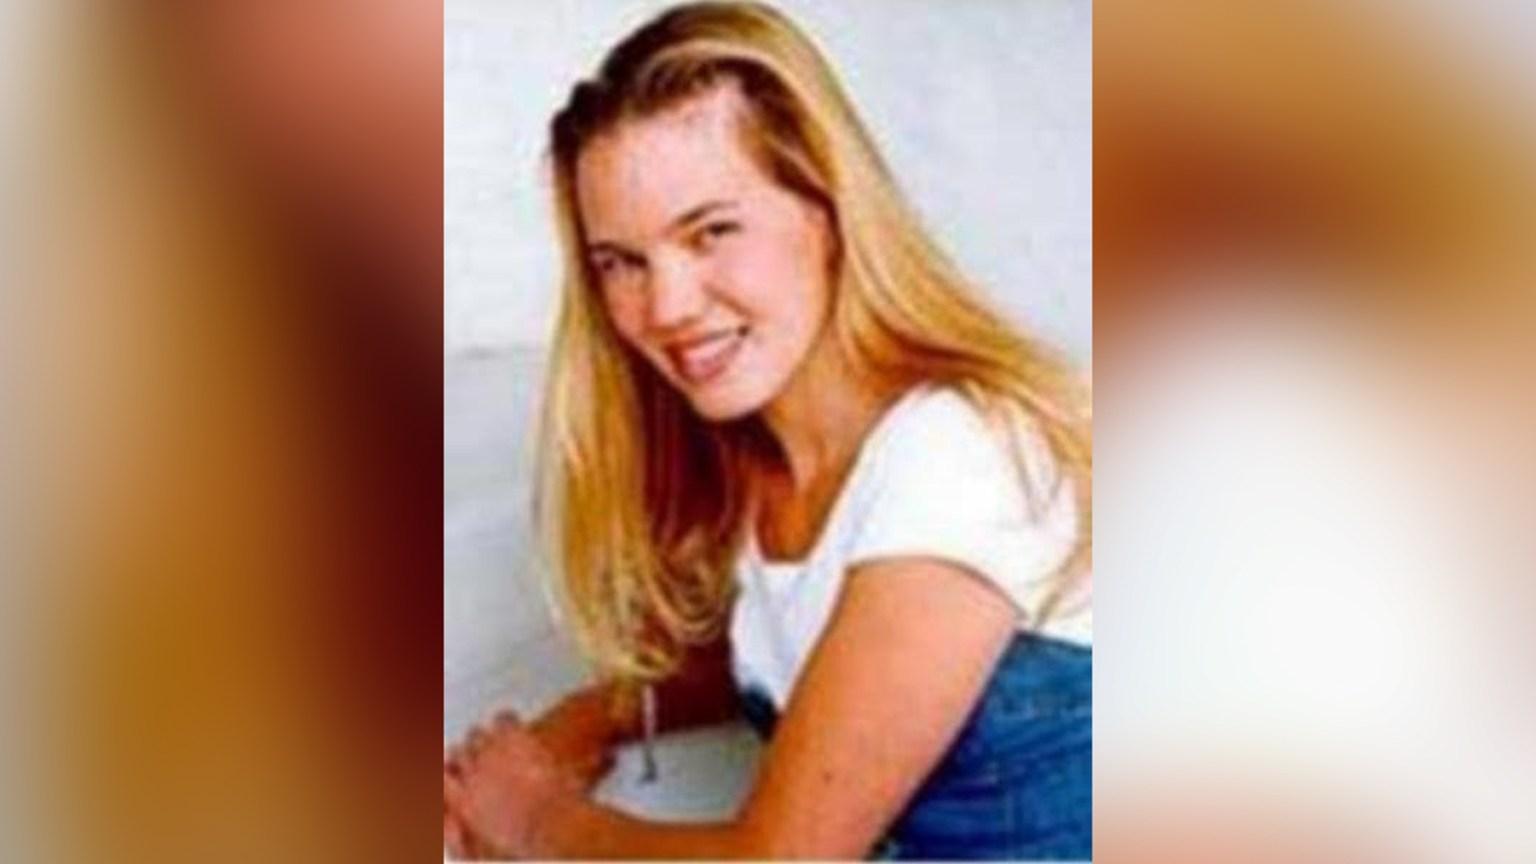 Cal Poly Alumni Hoping For Closure After Arrest in Kristin Smart Case